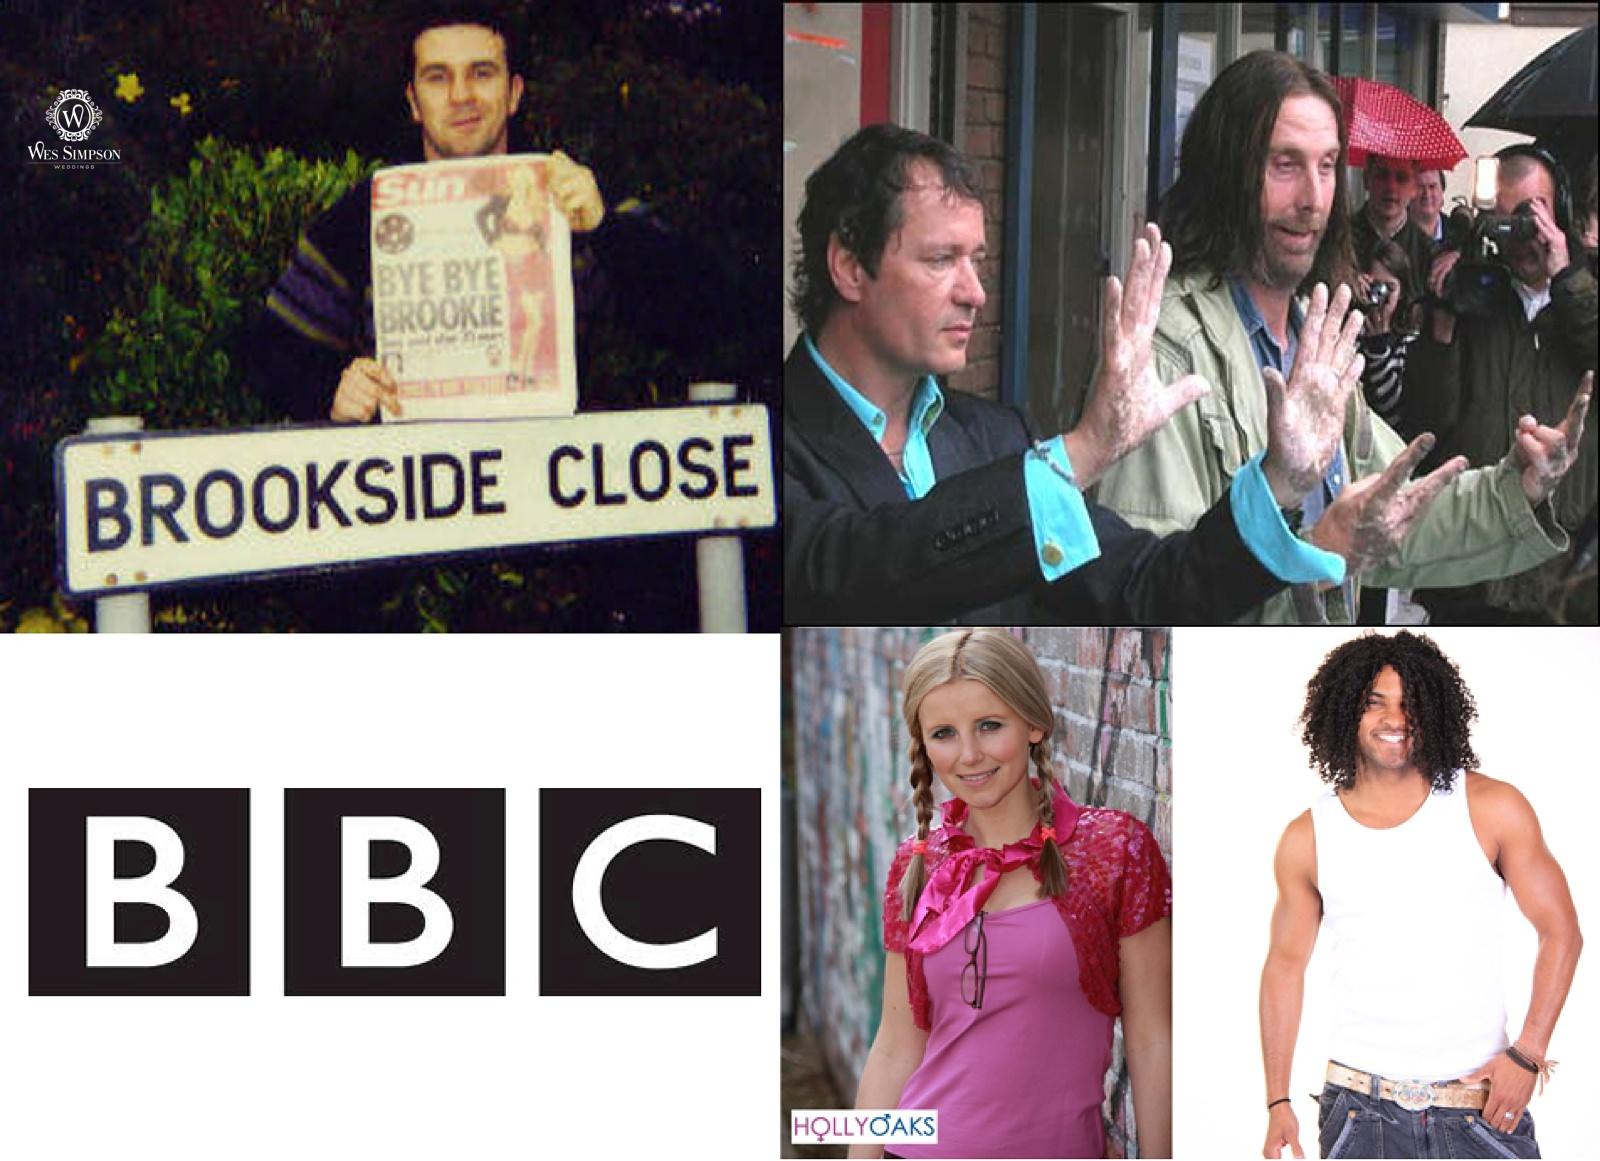 Media career, television camera man Hollyoaks, Brookside Shameless